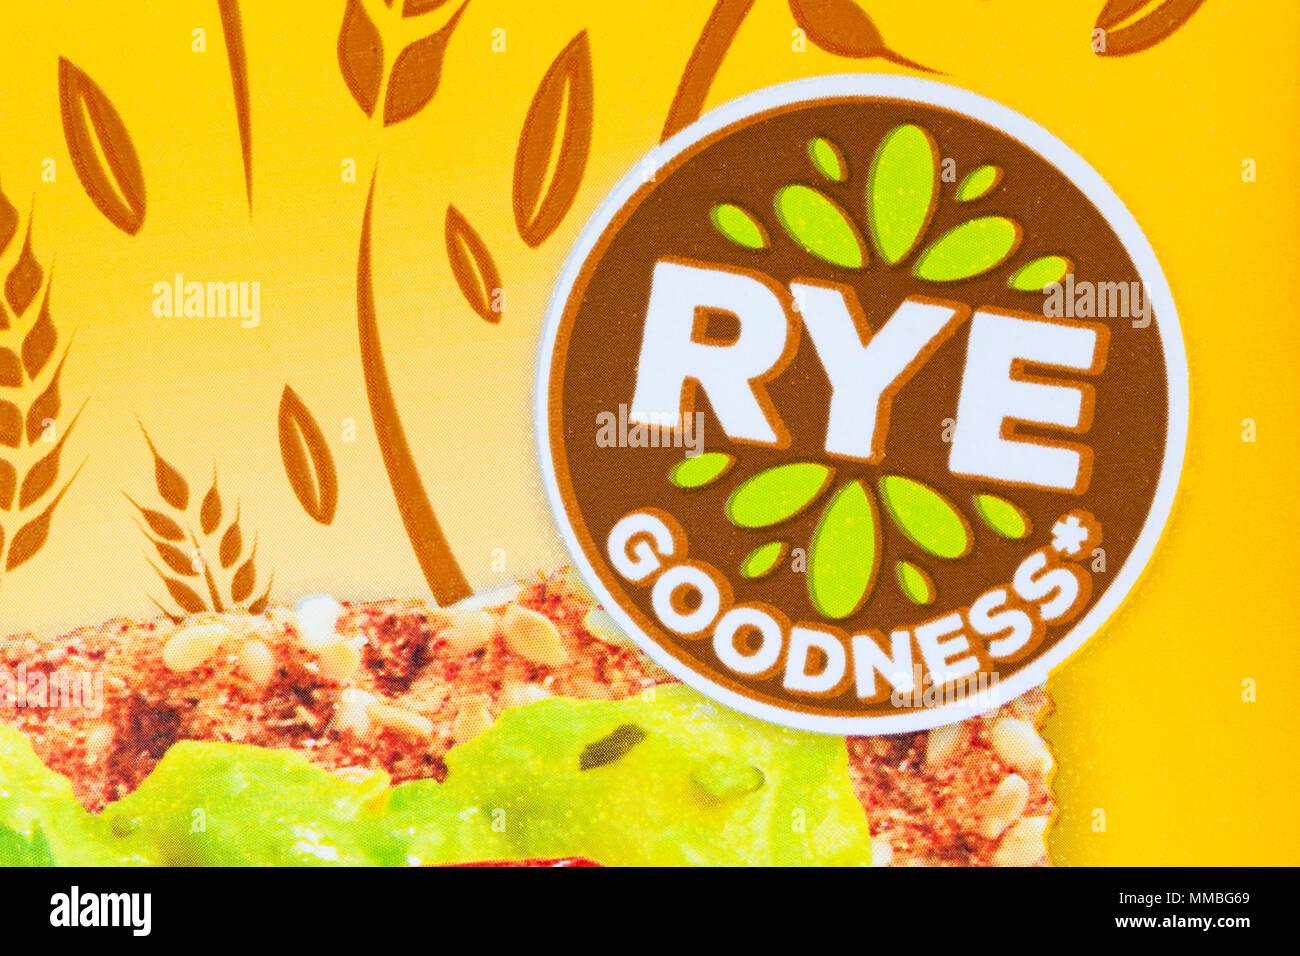 Rye Goodness detail on pack of Ryvita simply sesame crunchy rye breads - Stock Image